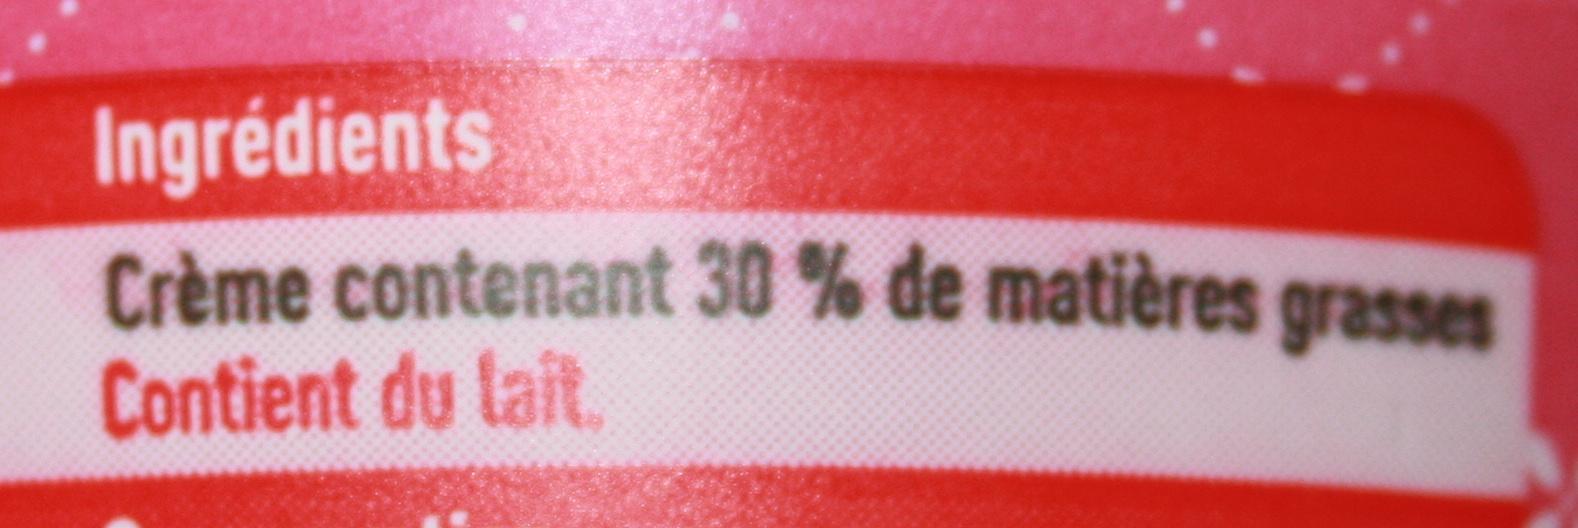 crème épaisse - Ingrediënten - fr